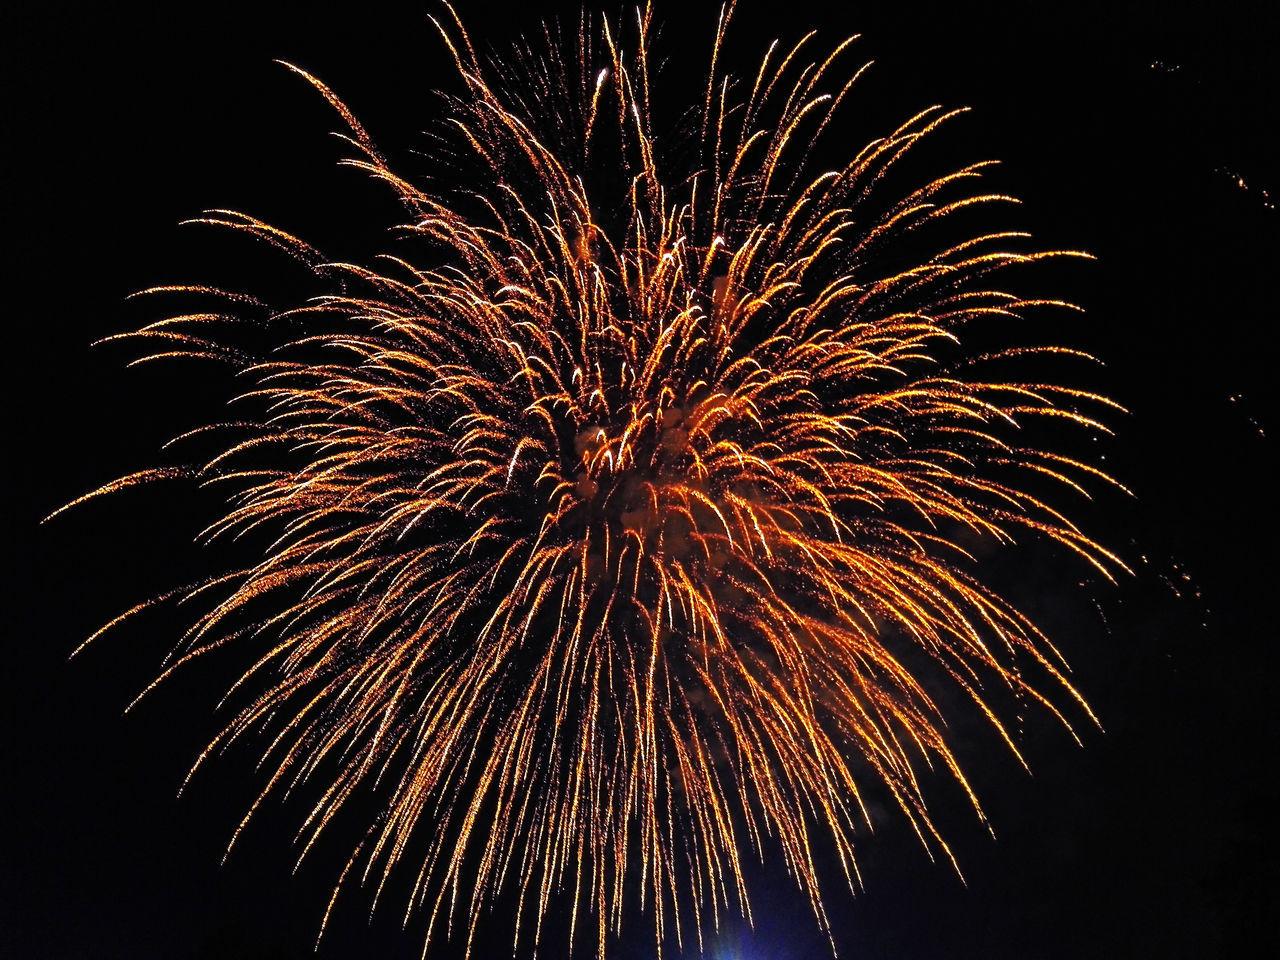 Celebration Night Firework Display No People Outdoors Event Russia Cremea Sevastopol' Sevastopol  Севастополь Huawei Honor6 Huawei Honor 6 Fireworks салют